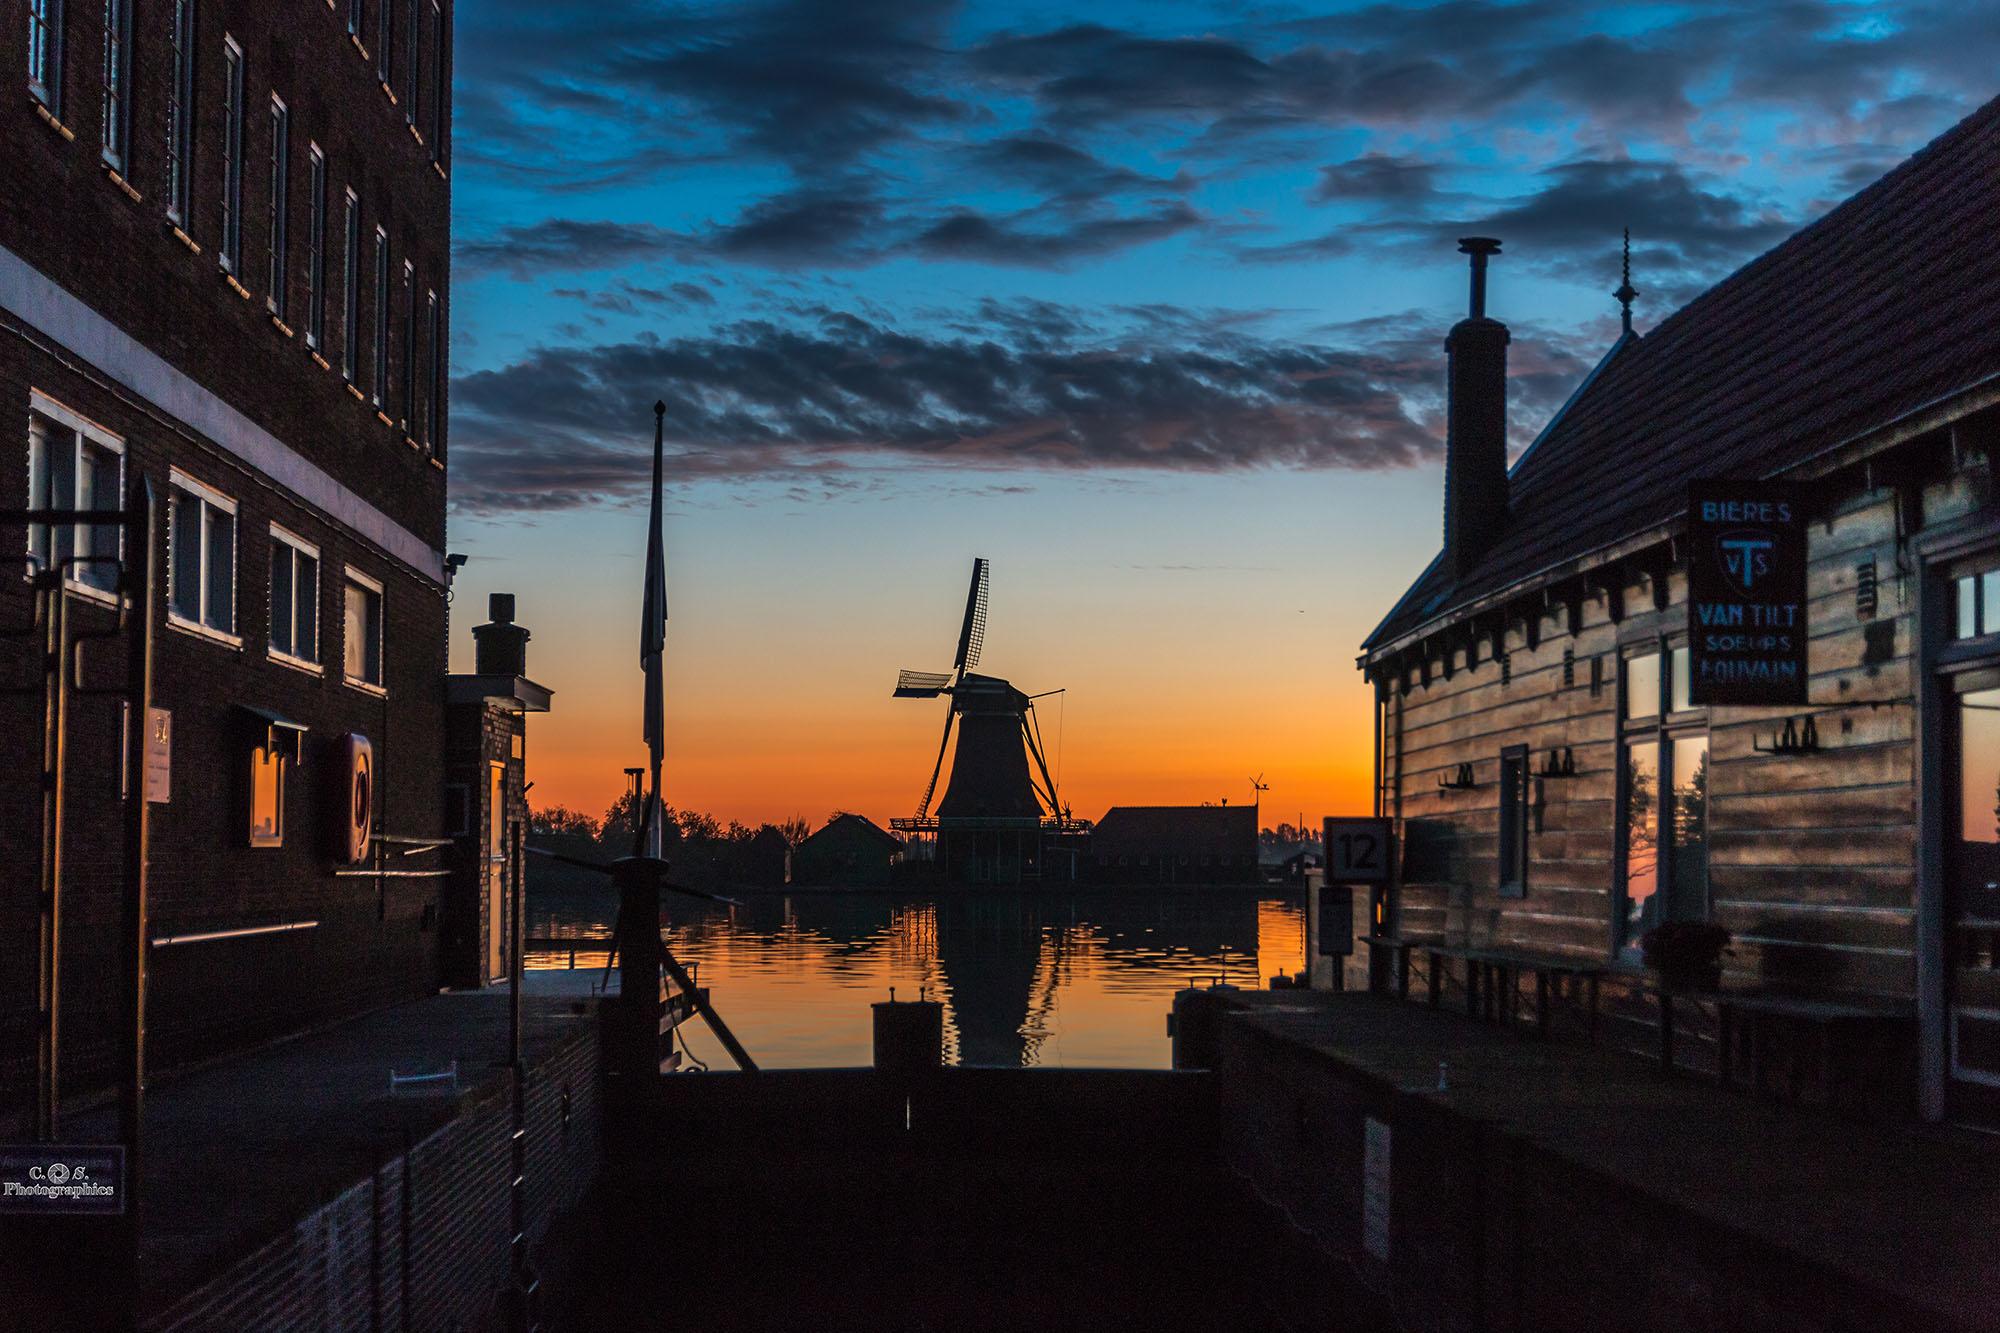 Windmills of Zaanse Schans, Netherlands